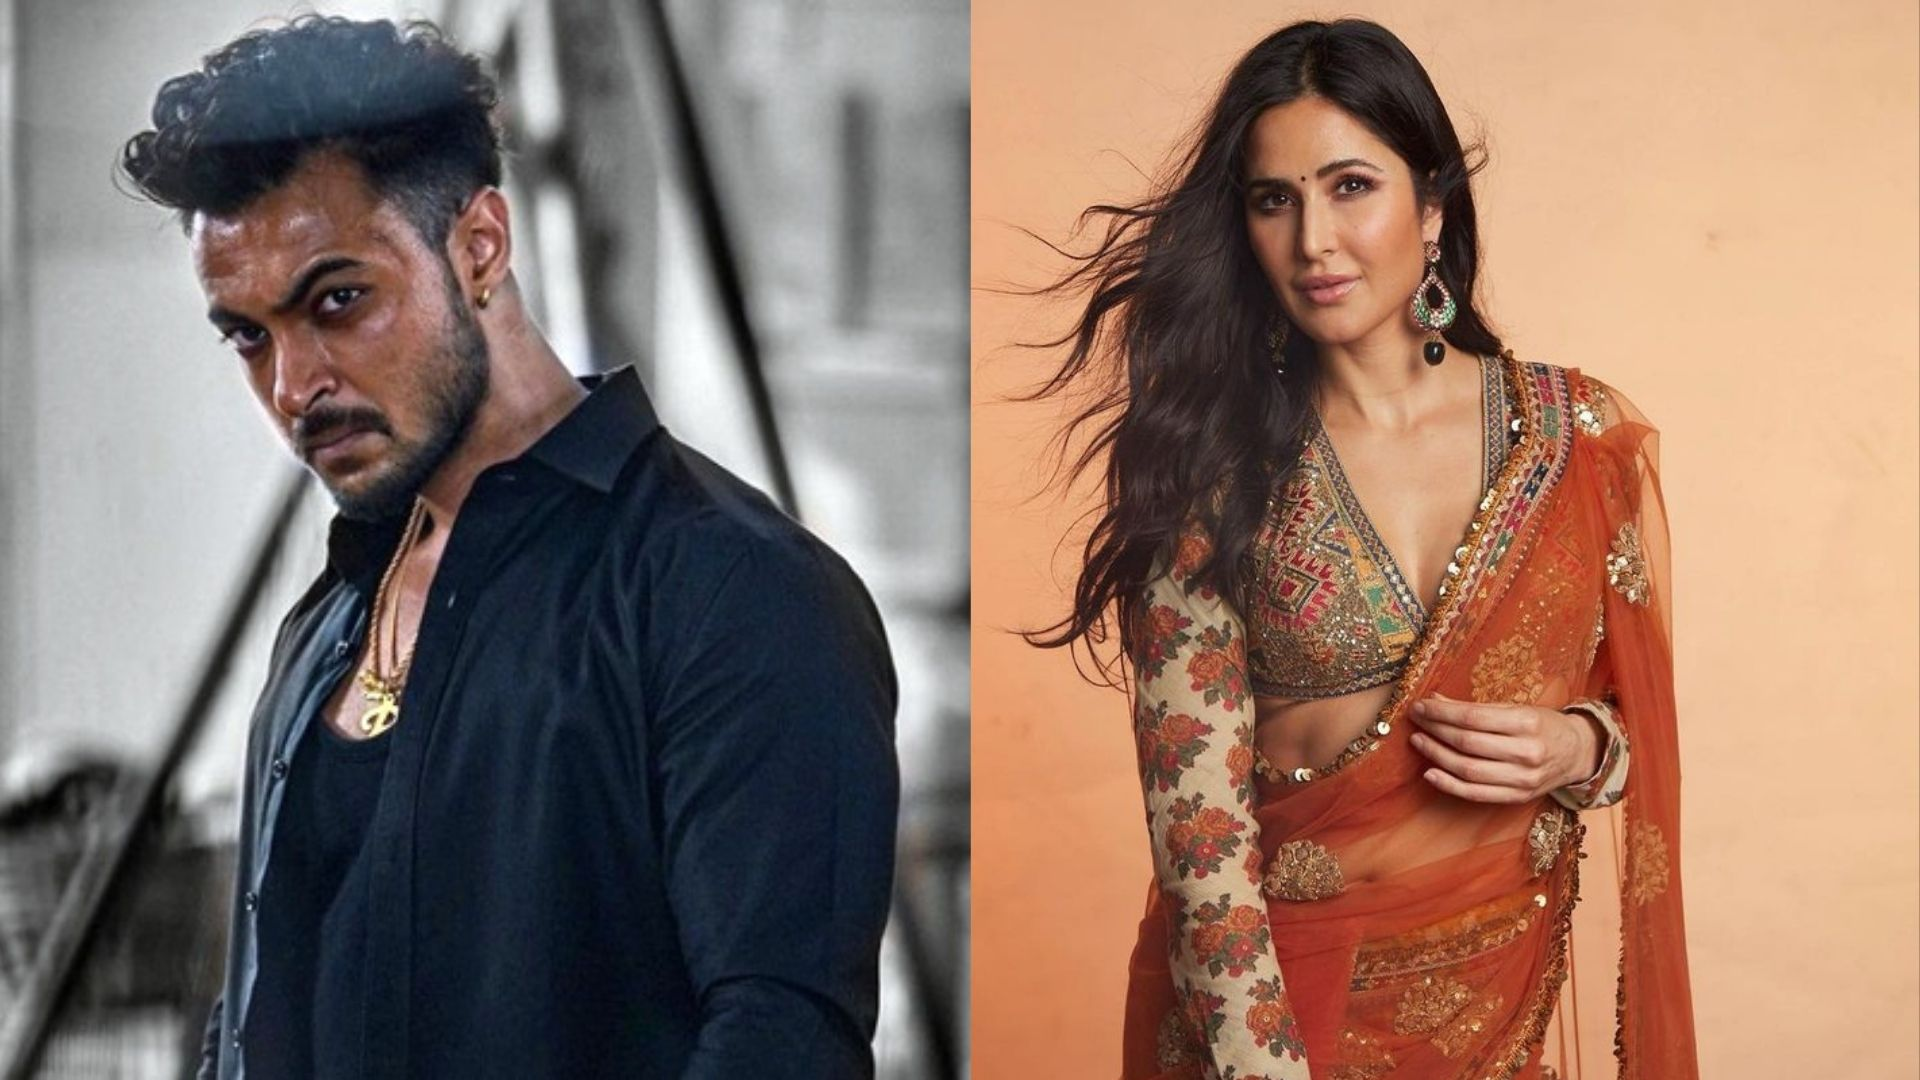 Antim: Katrina Kaif Heaps Praise On Aayush Sharma's Intriguing Look From The Film; Calls it 'FAB'